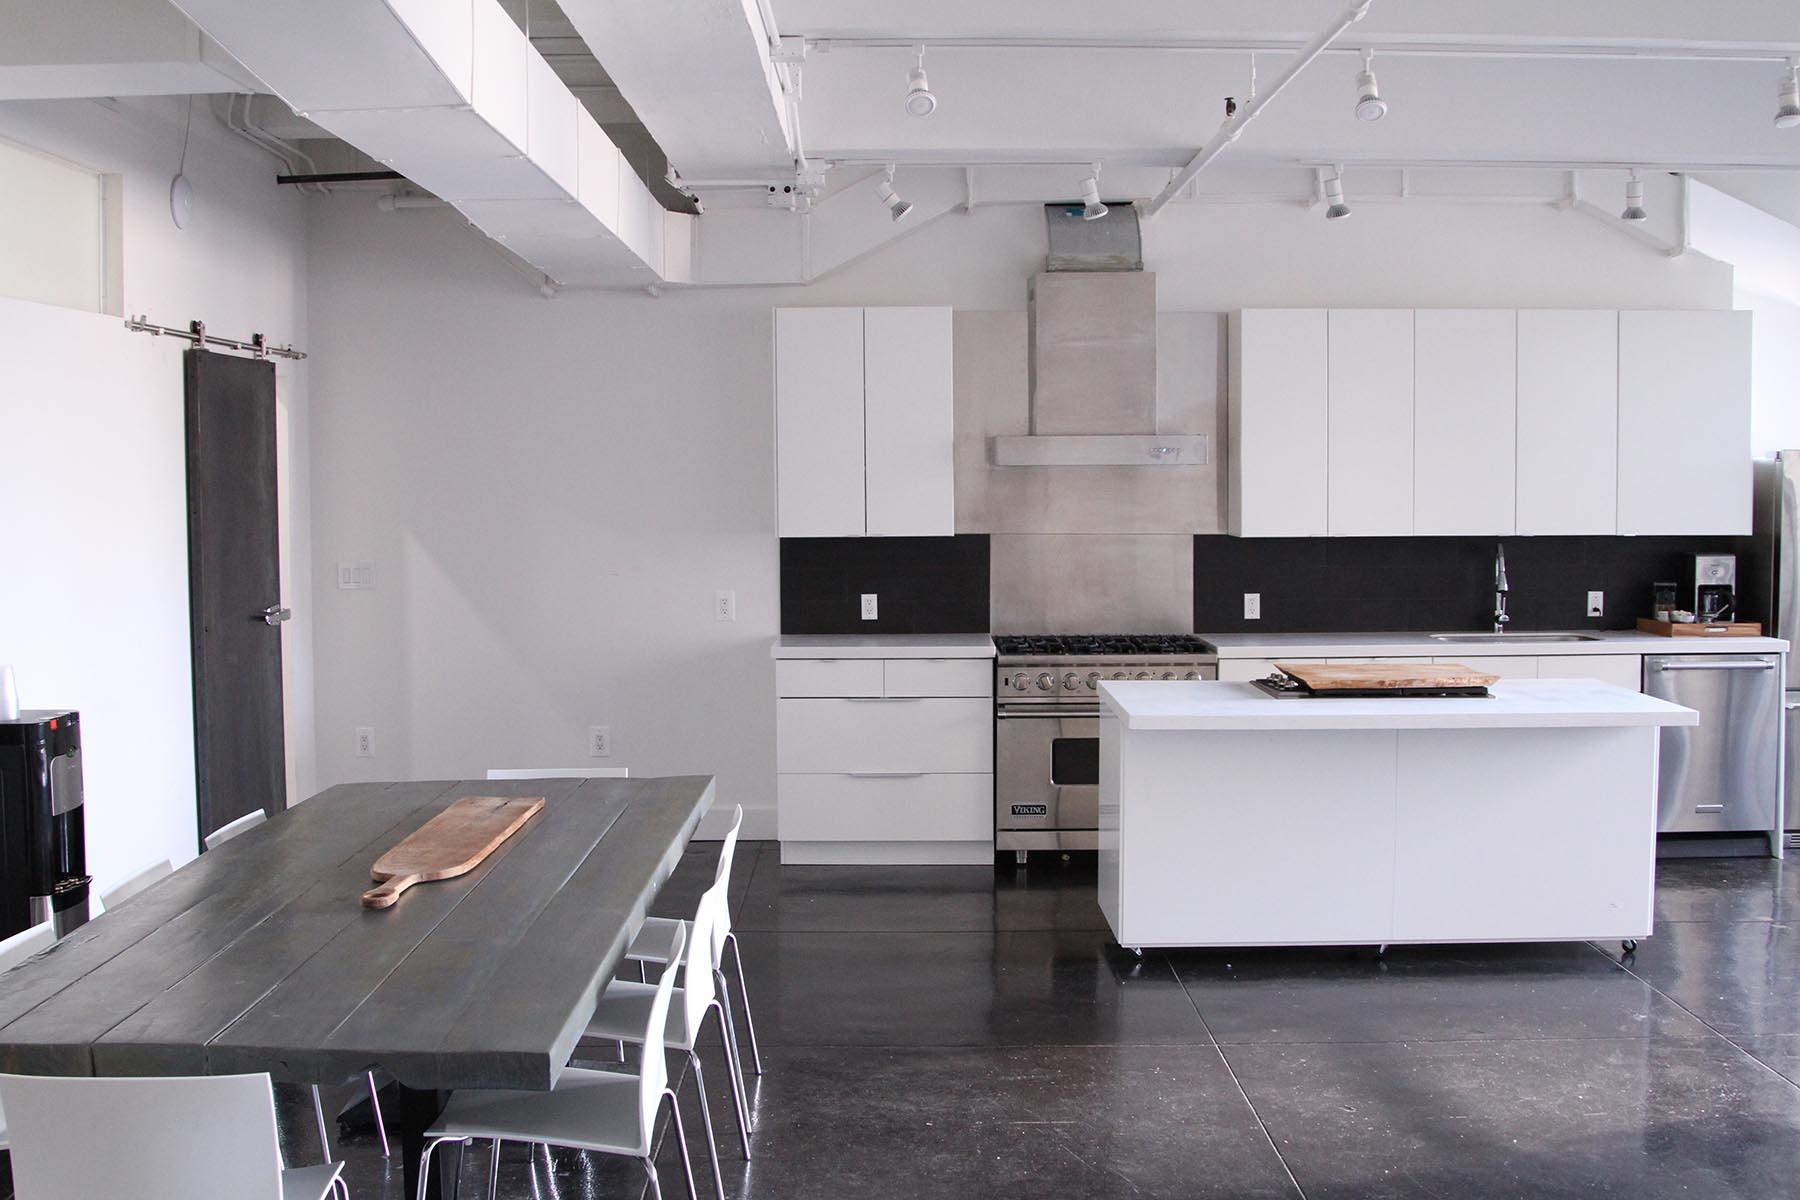 Shooting Kitchen Studio